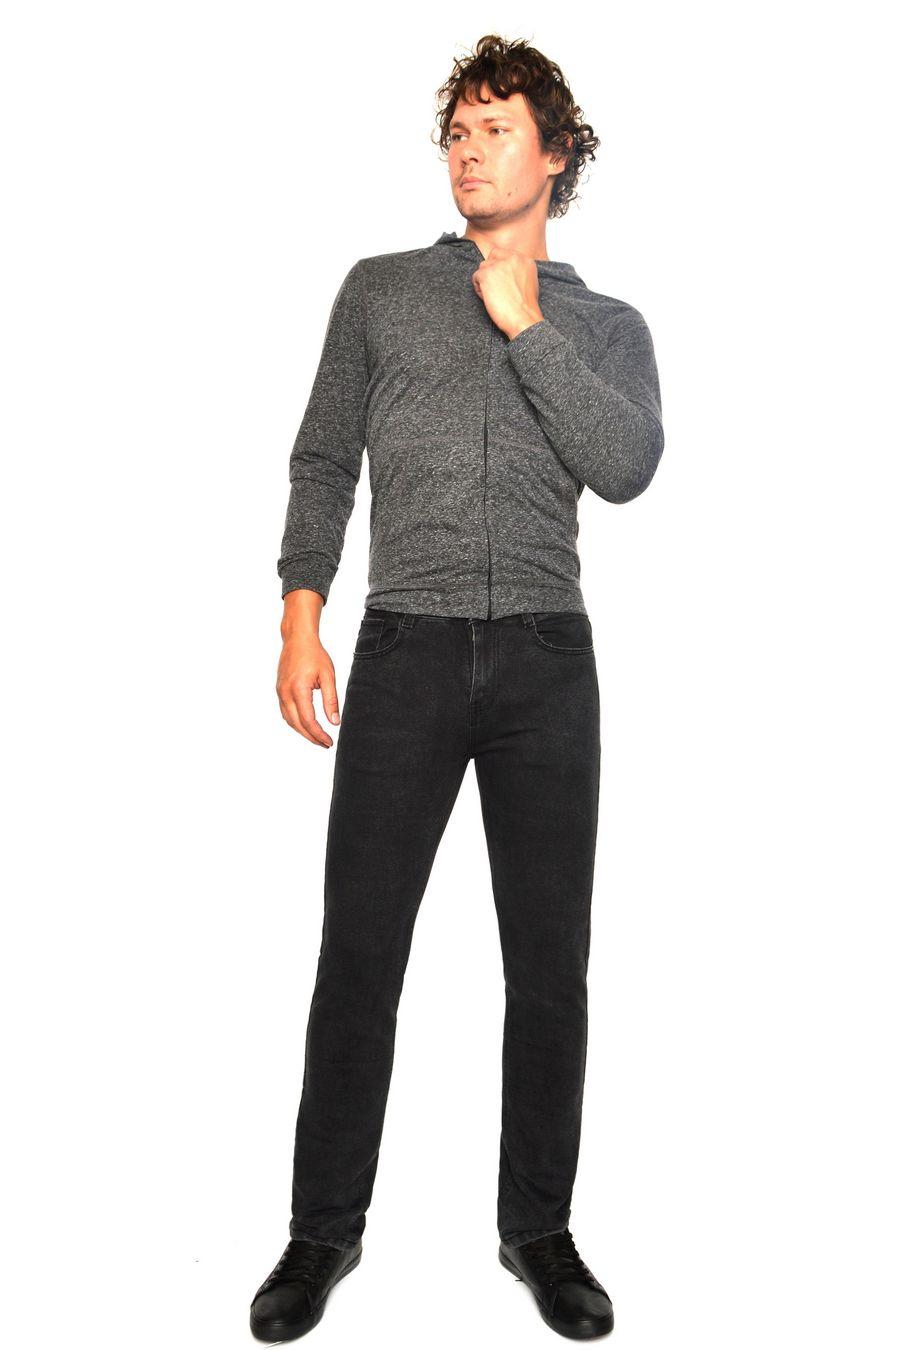 Джинсы мужские Luxury Vision L2077 - фото 2